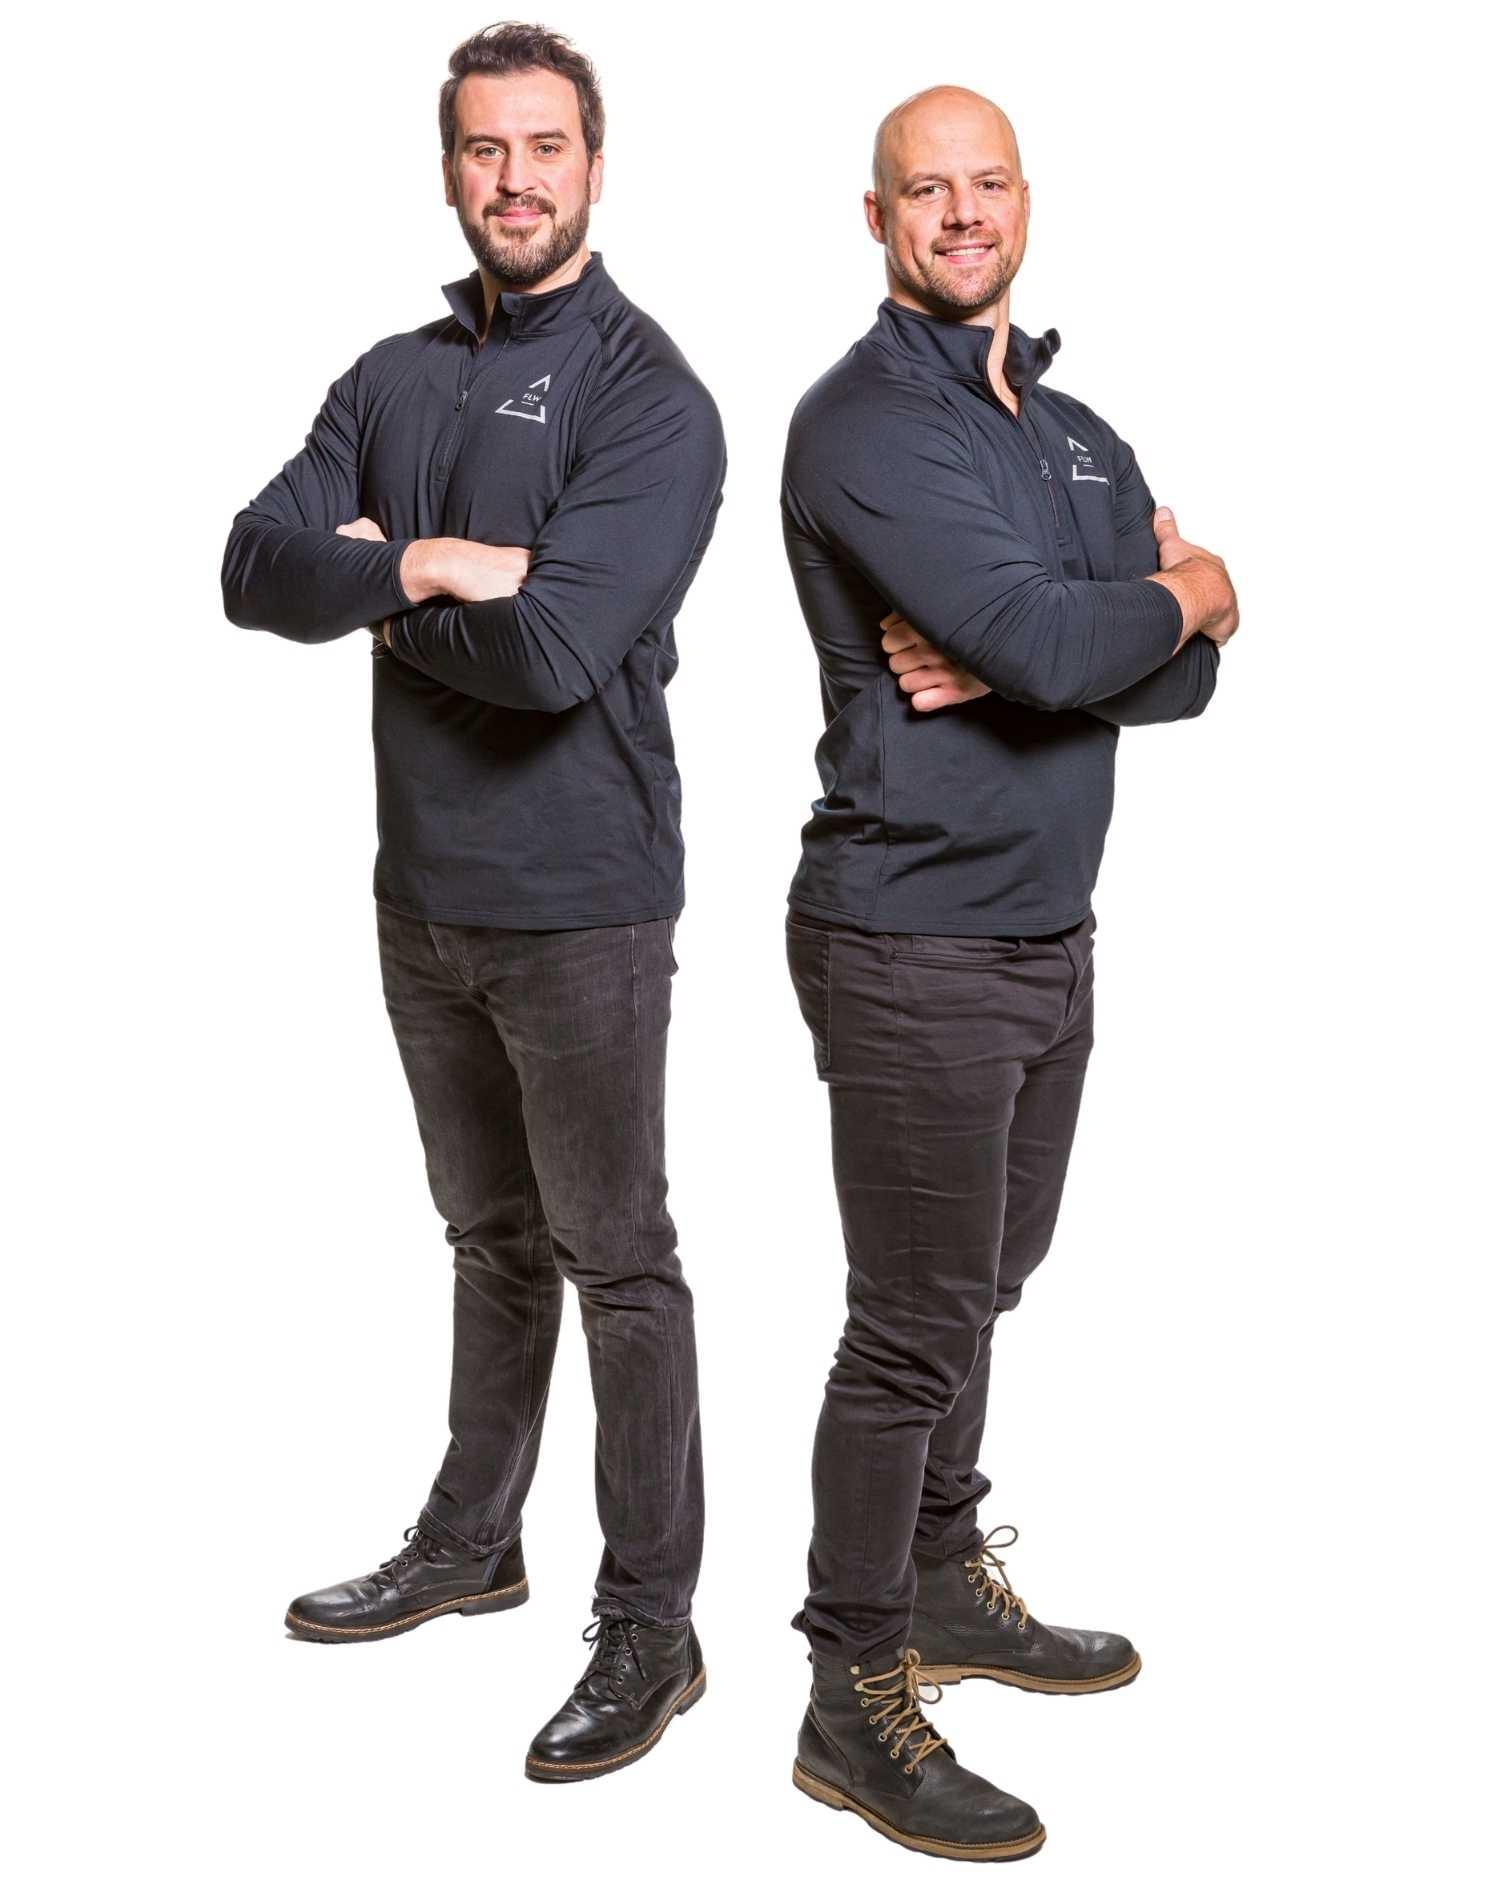 Dr. James Midboe and Ben Utecht